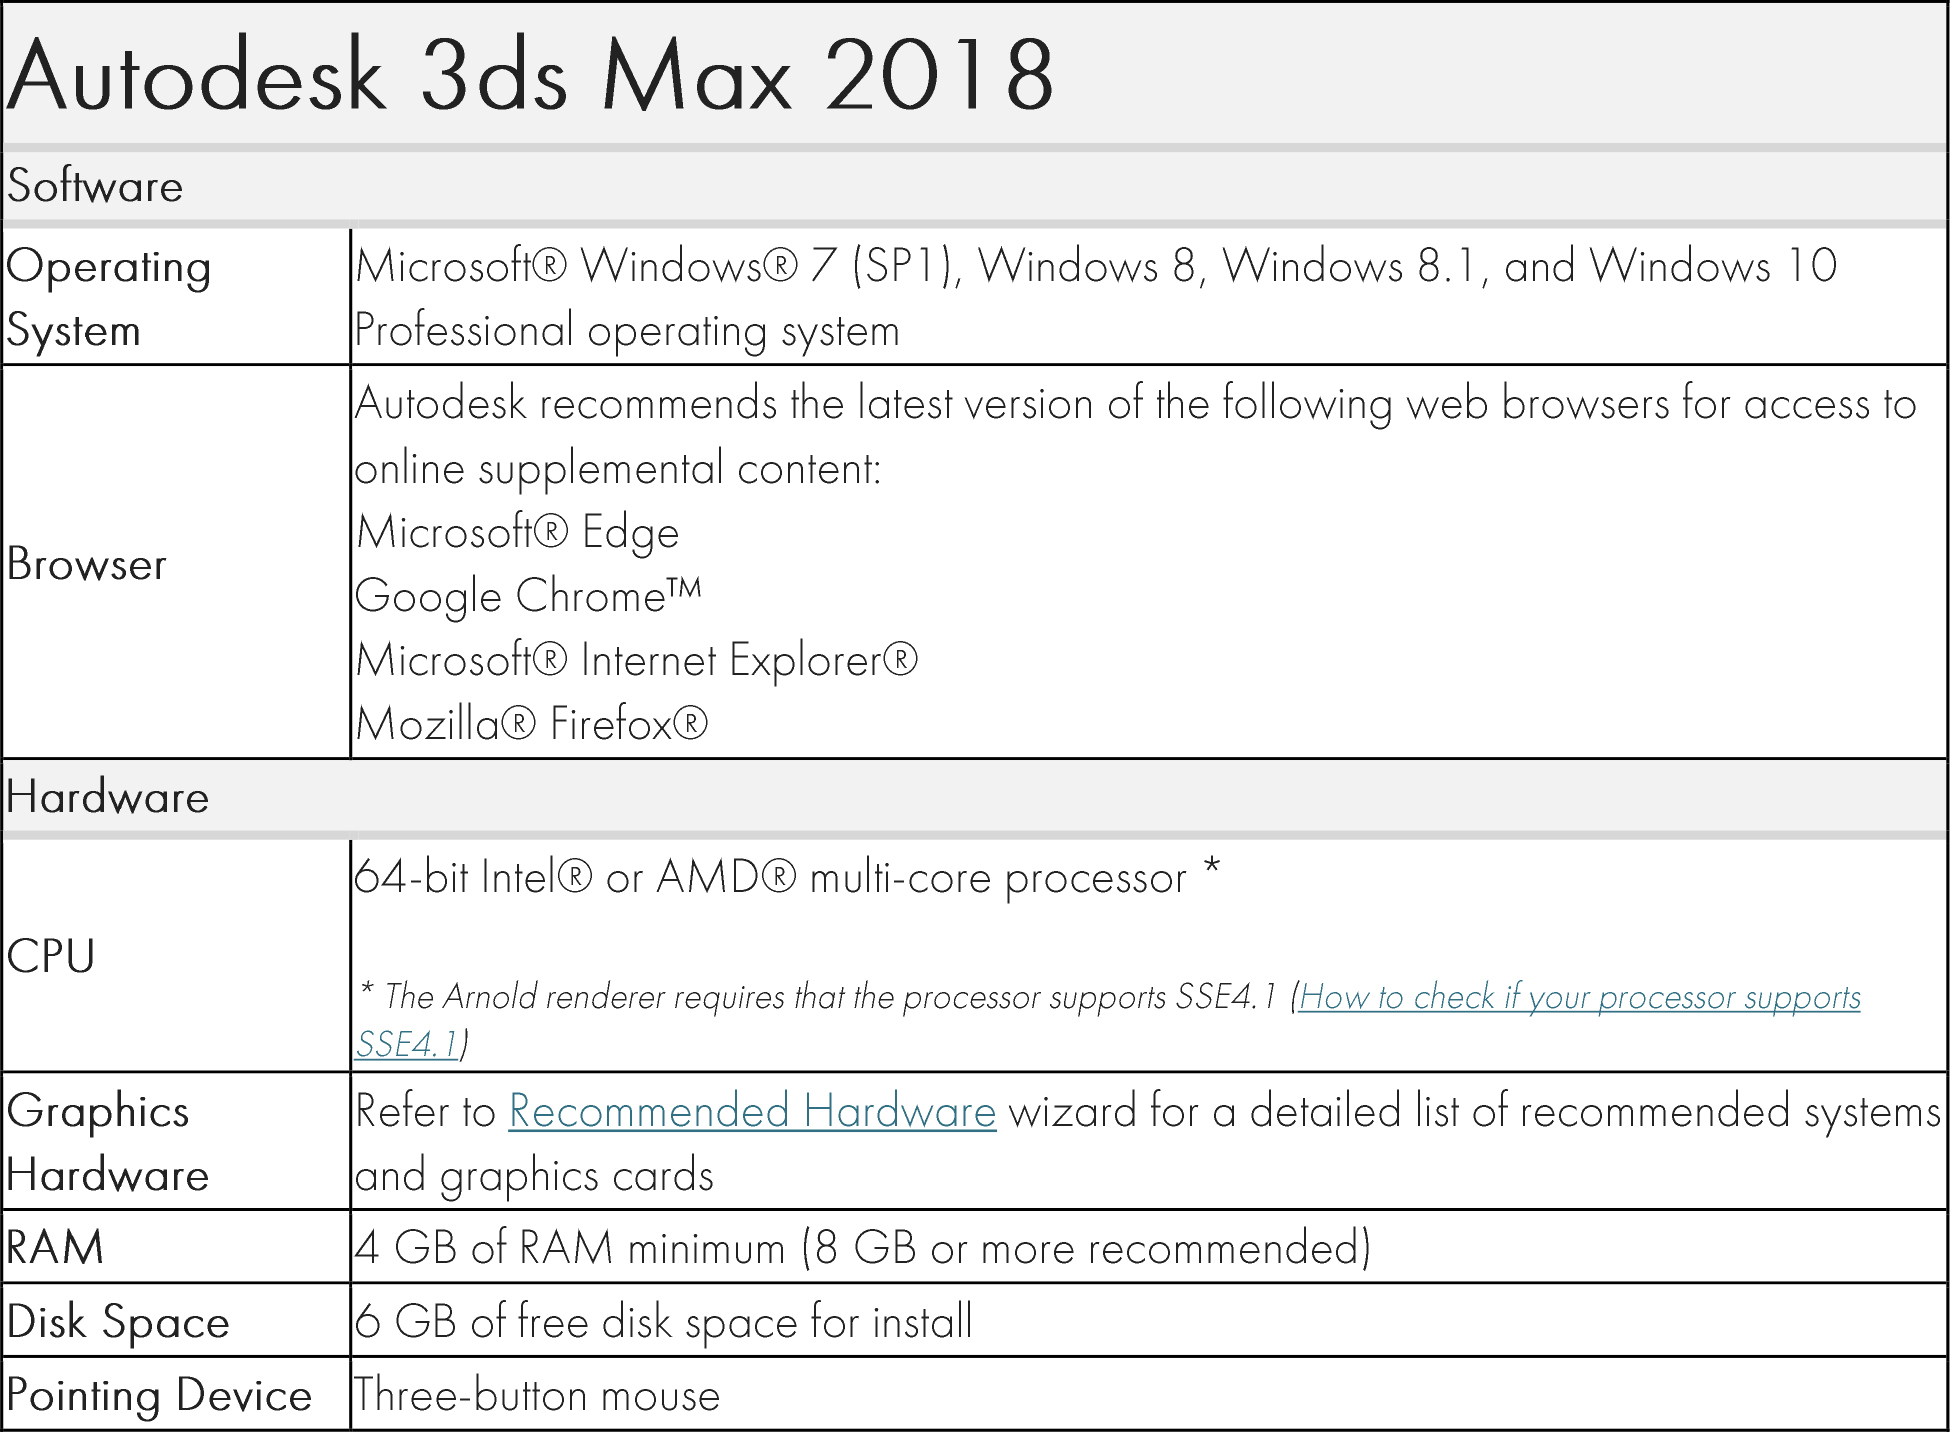 Autodesk 3ds Max 2018.jpg